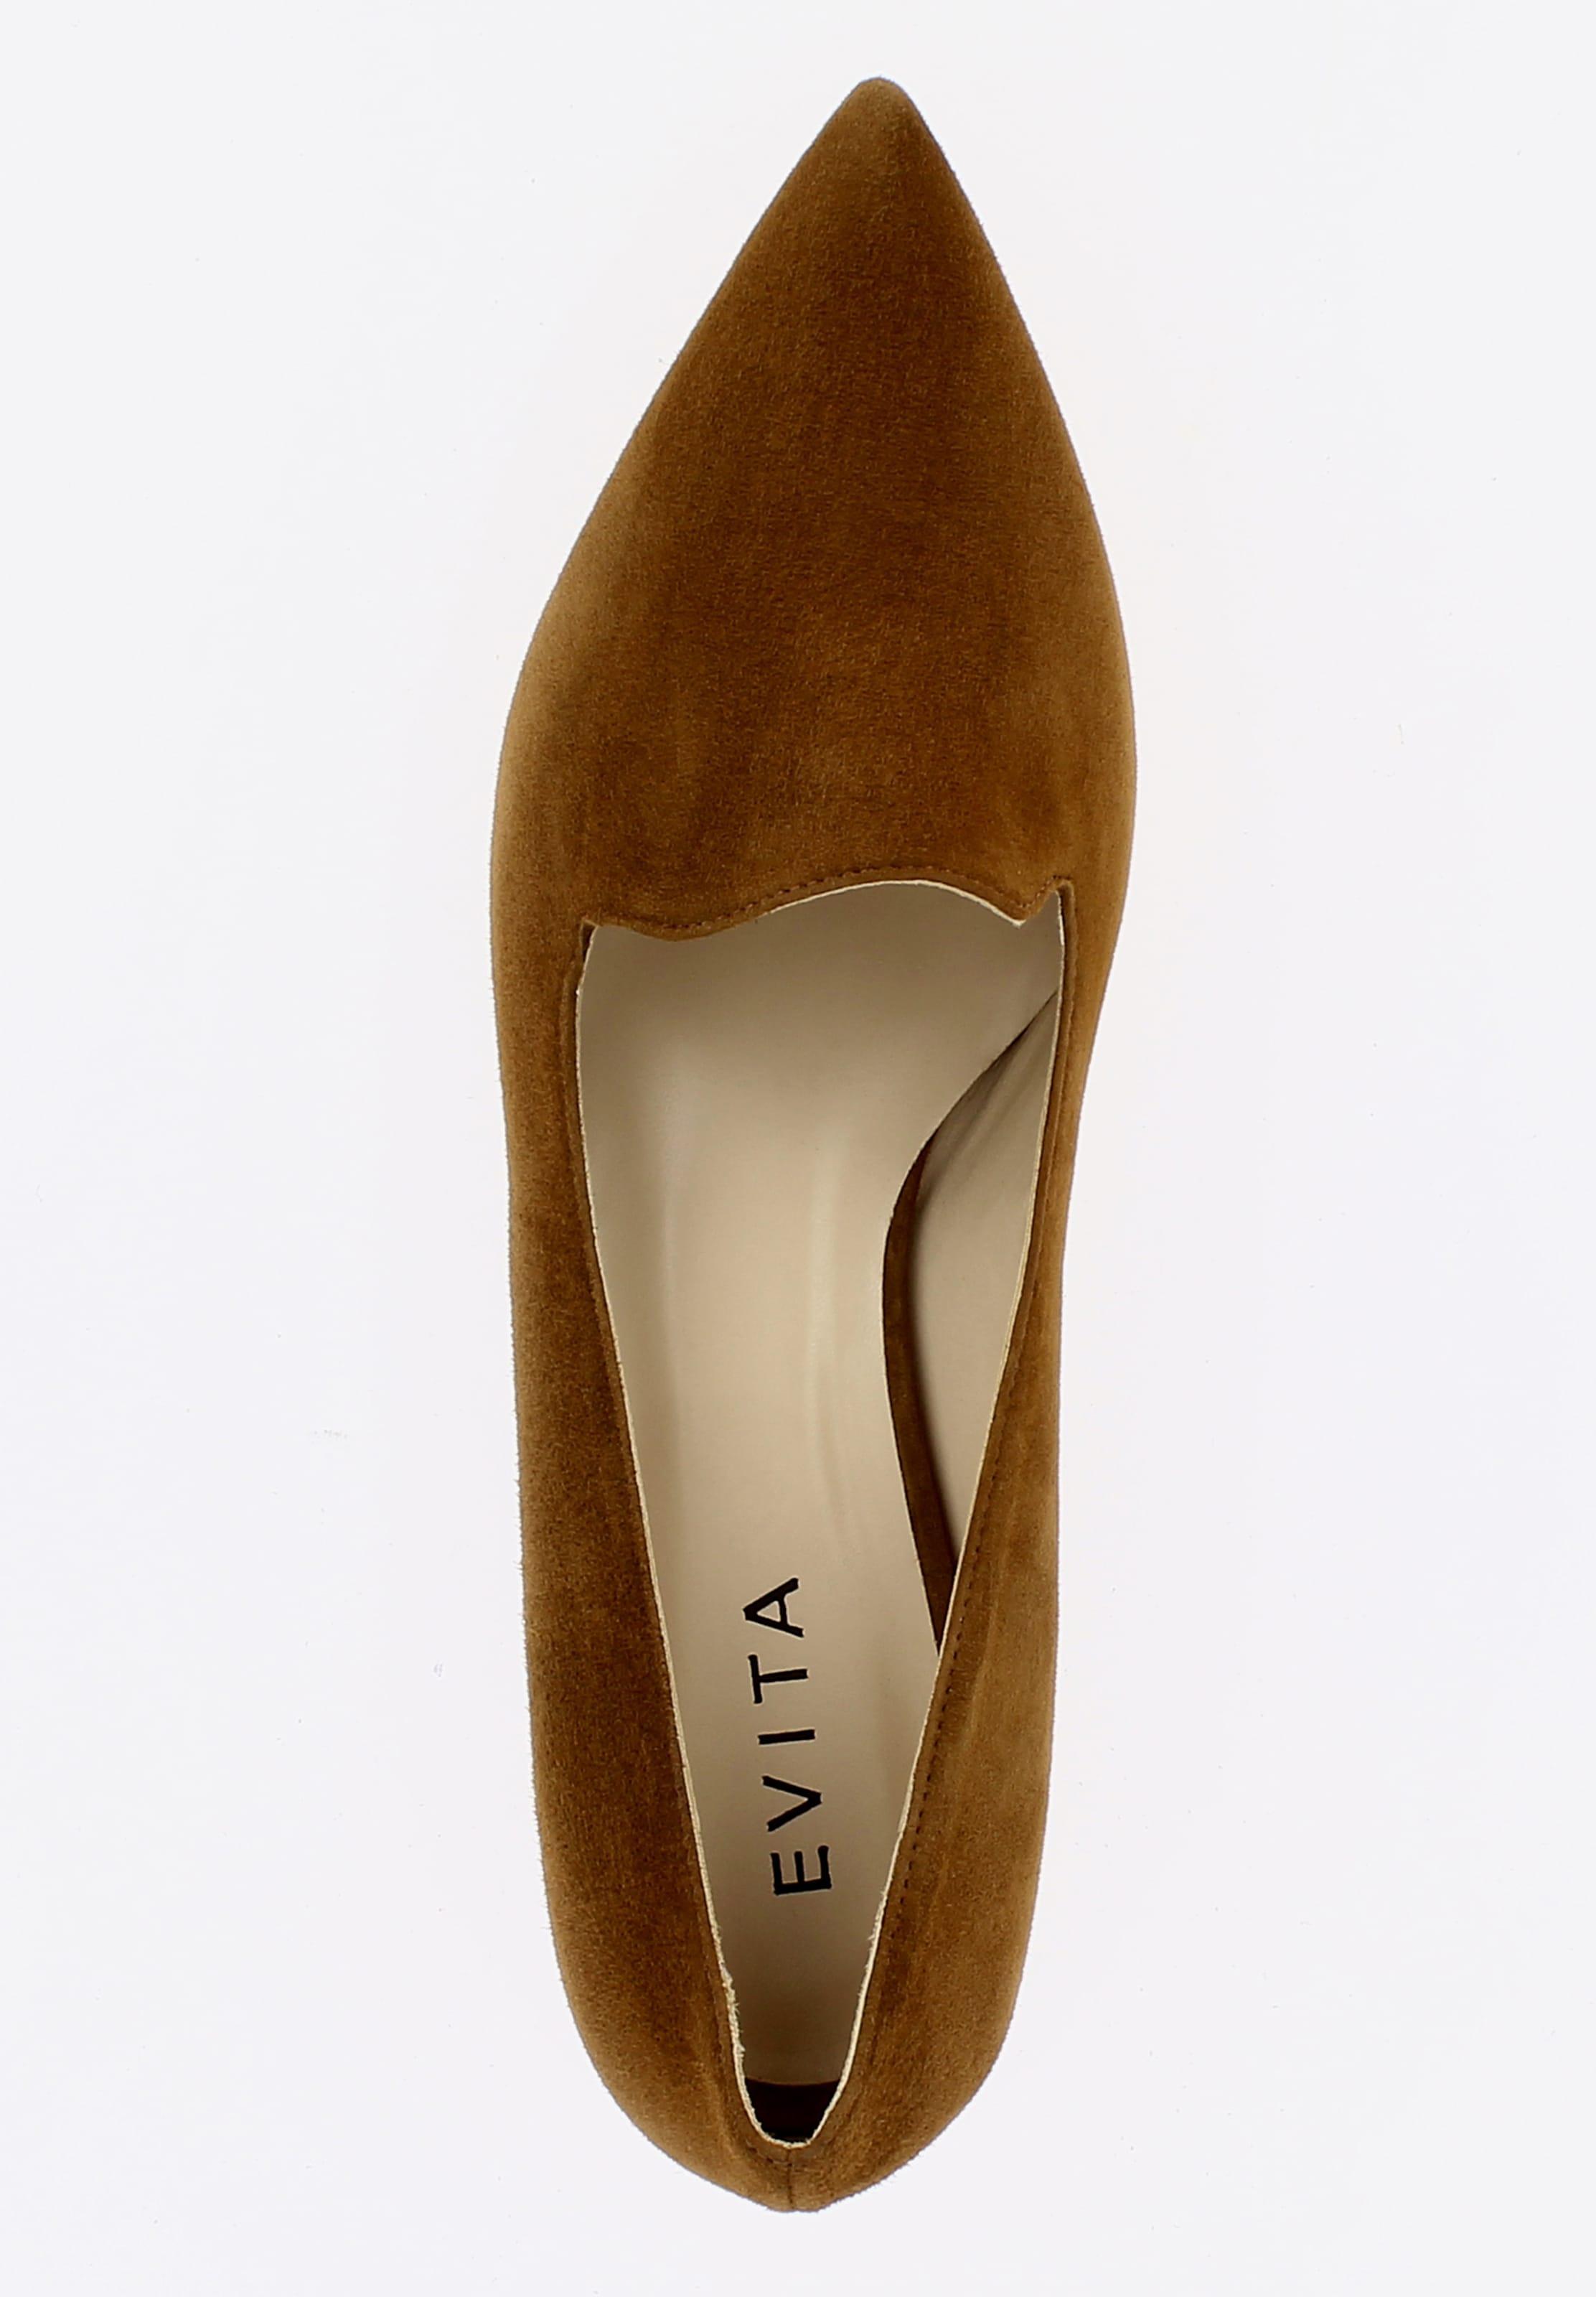 Evita En Evita Chaussons Chaussons Cognac 'franca' n0wXOk8P